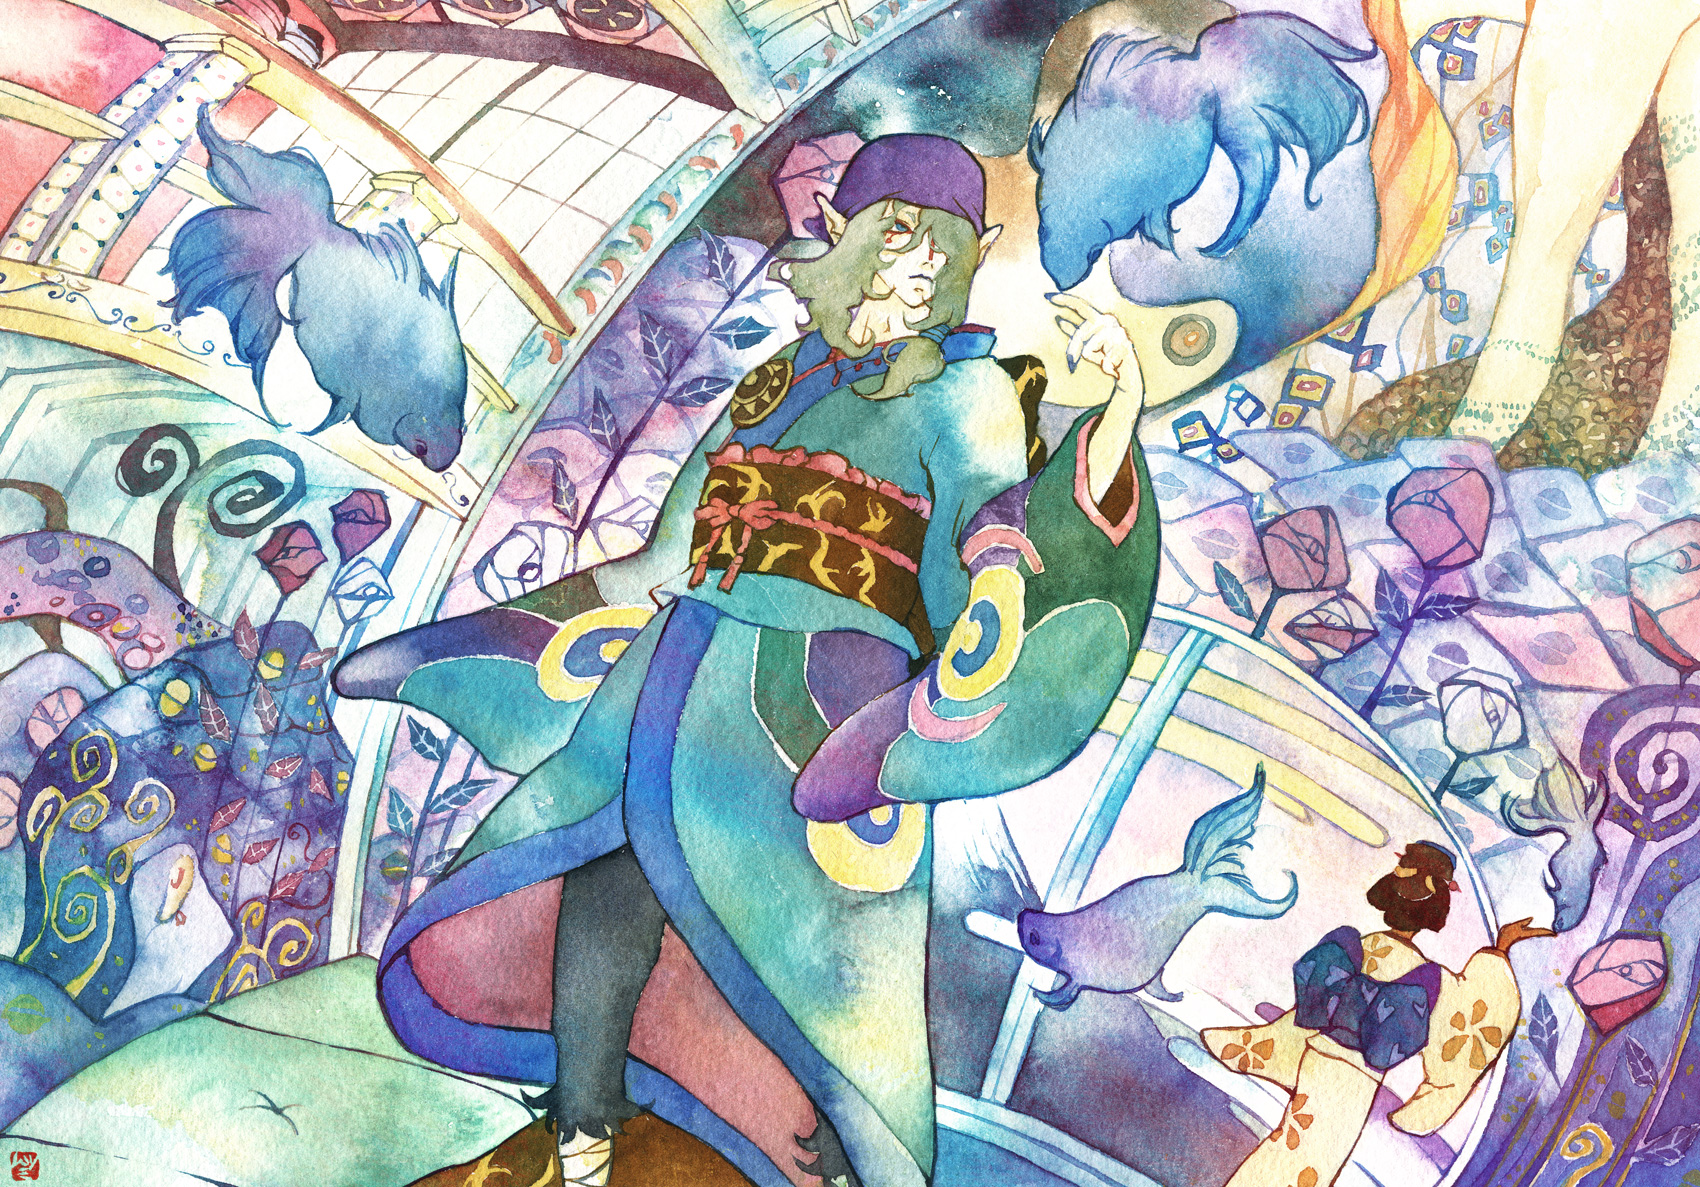 Ghibli Wallpaper Iphone Mononoke Wallpaper And Background Image 1700x1187 Id